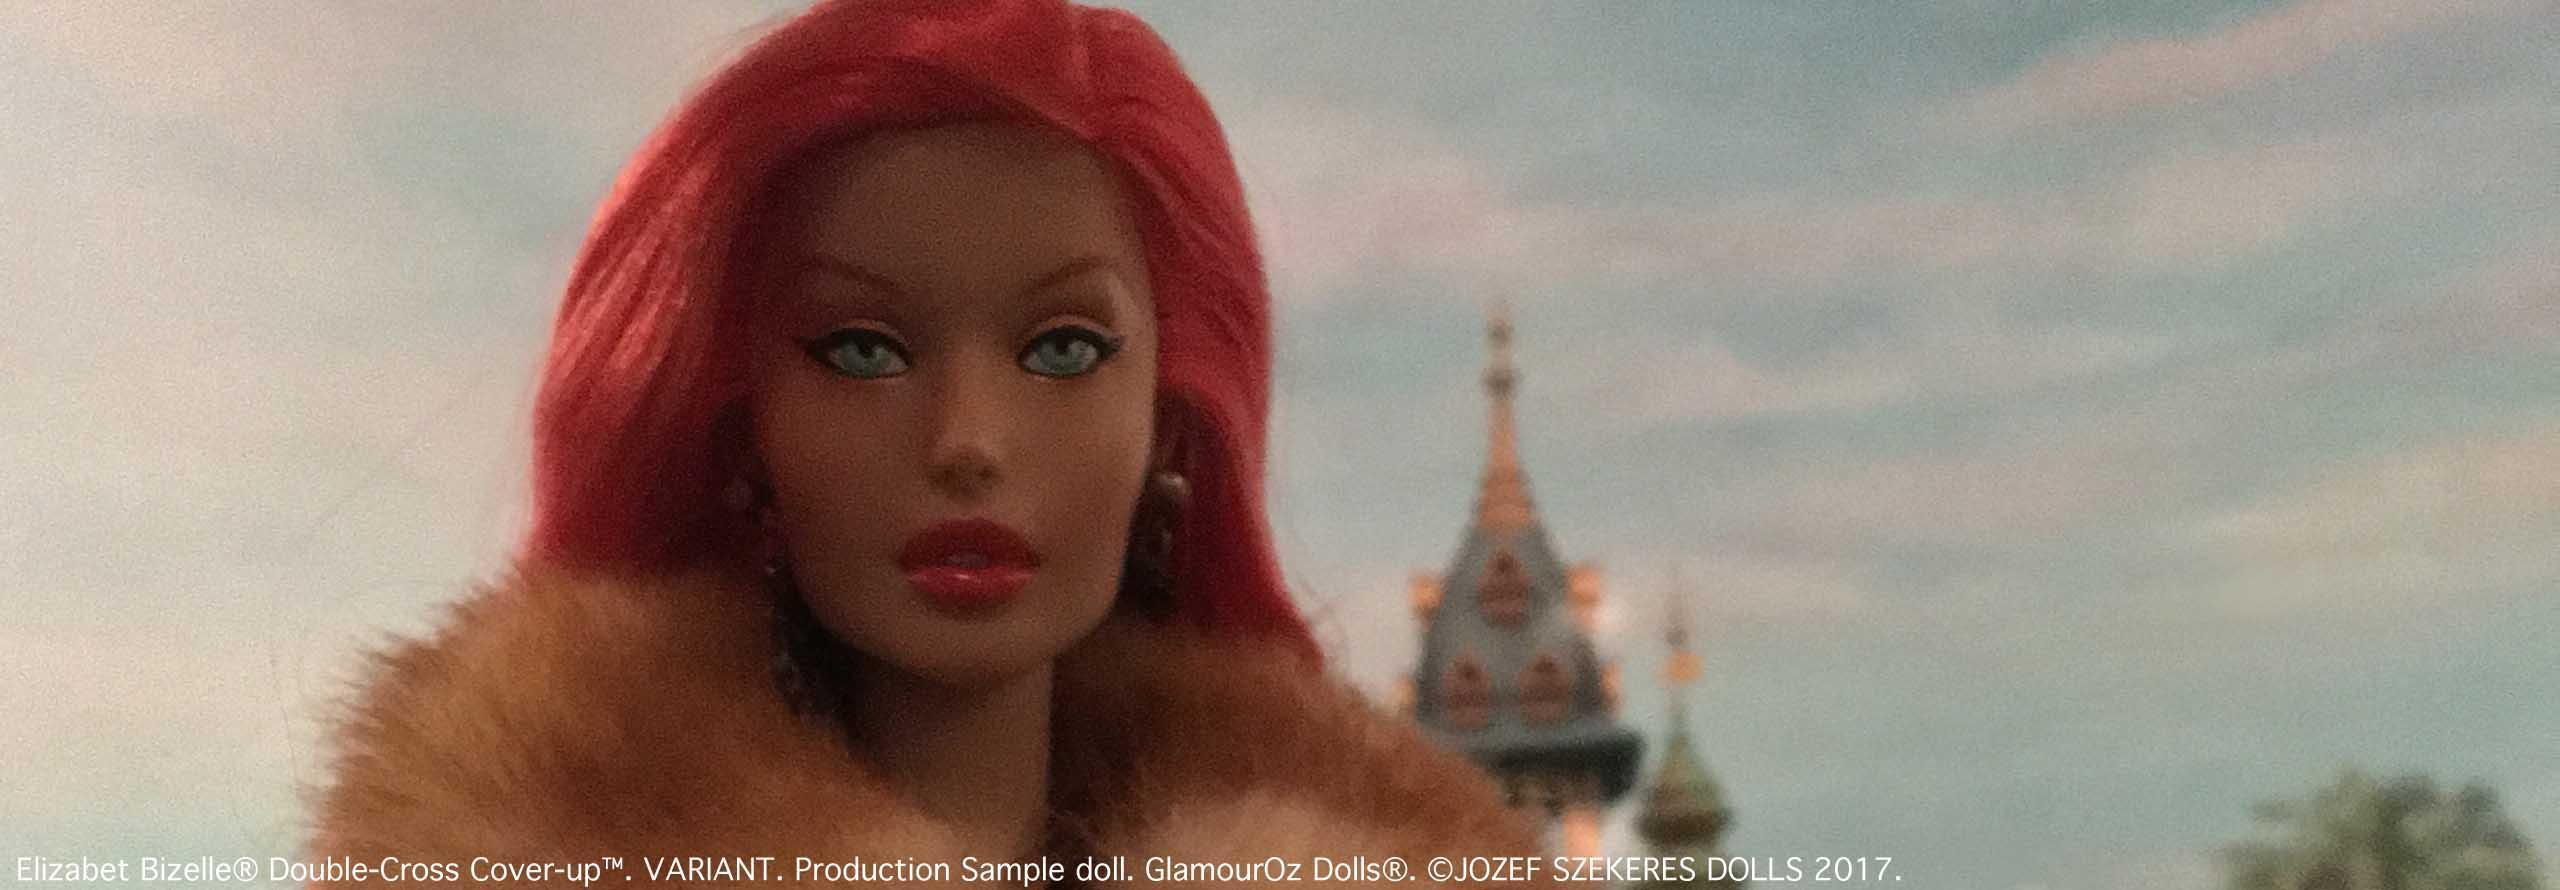 GODs Slider 9.Elizabet Bizelle® Double-Cross Cover-Up™.Production Sample doll